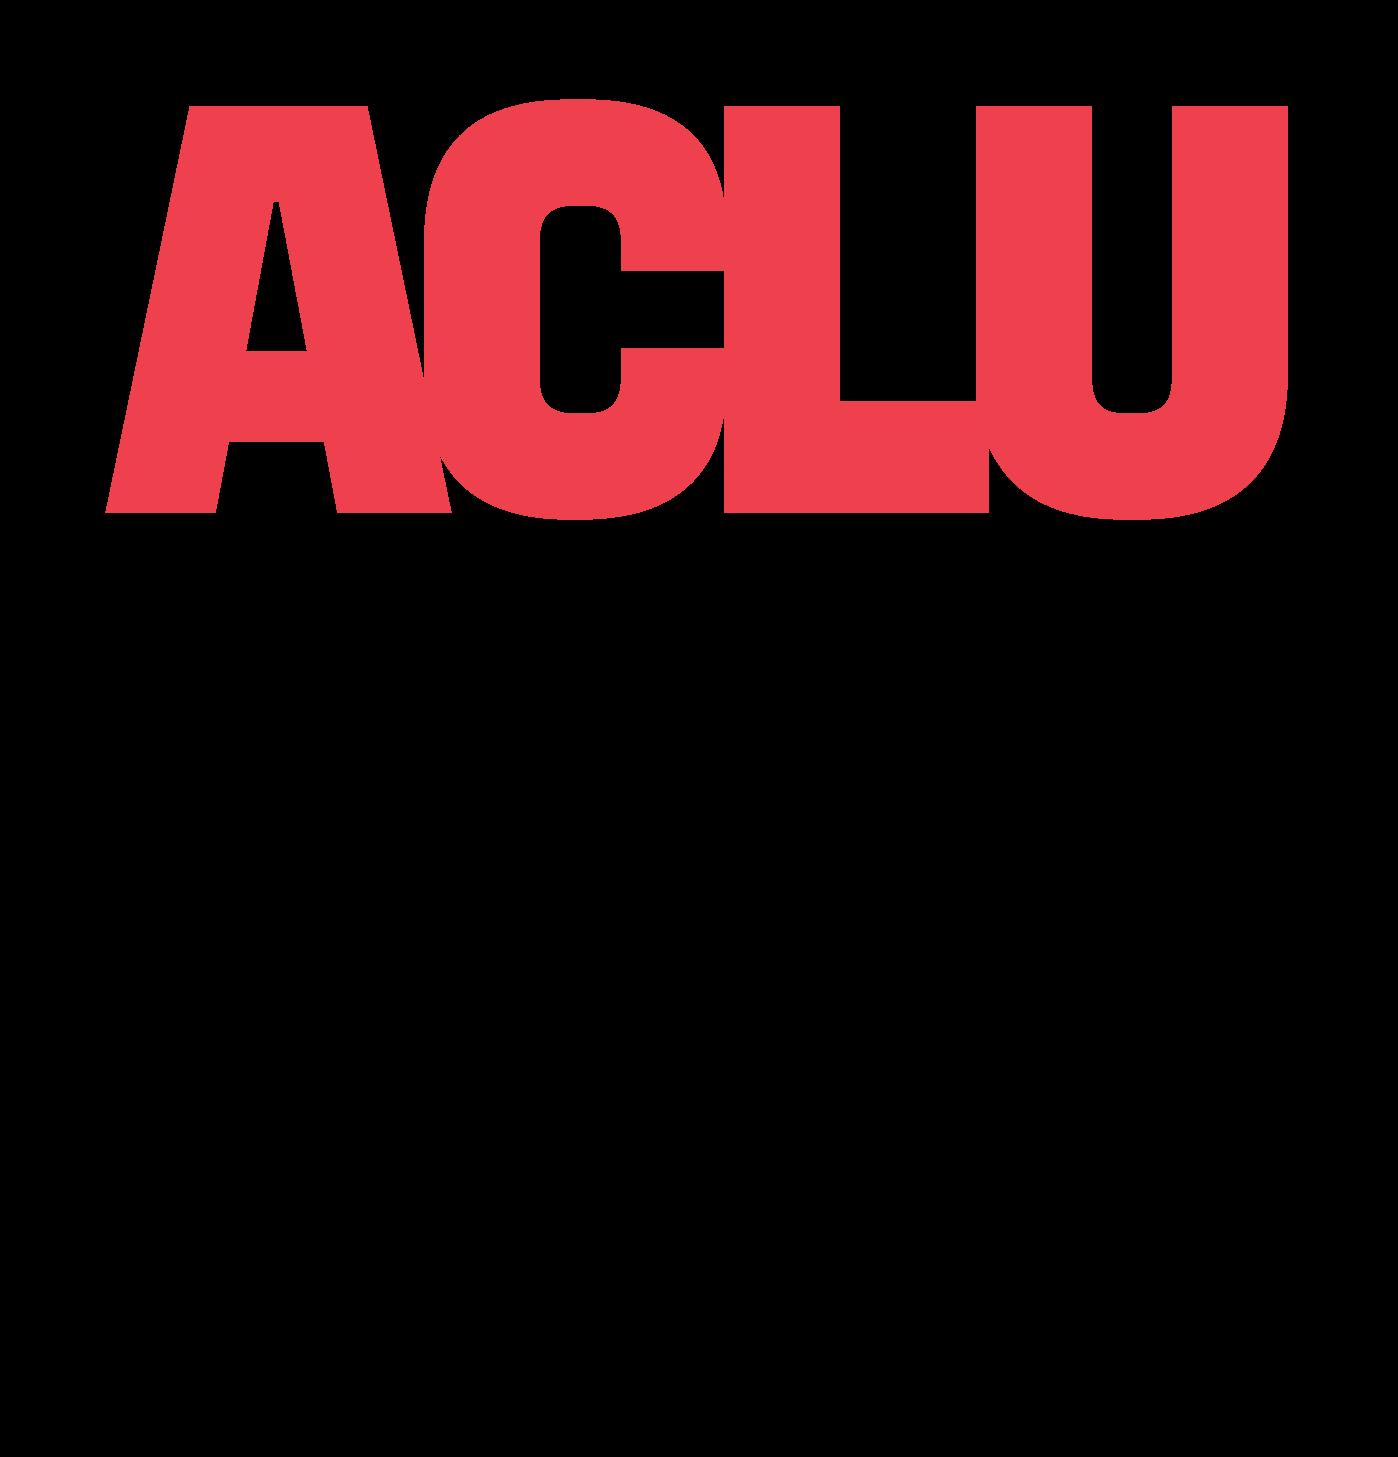 ACLU BRC Logo square.png